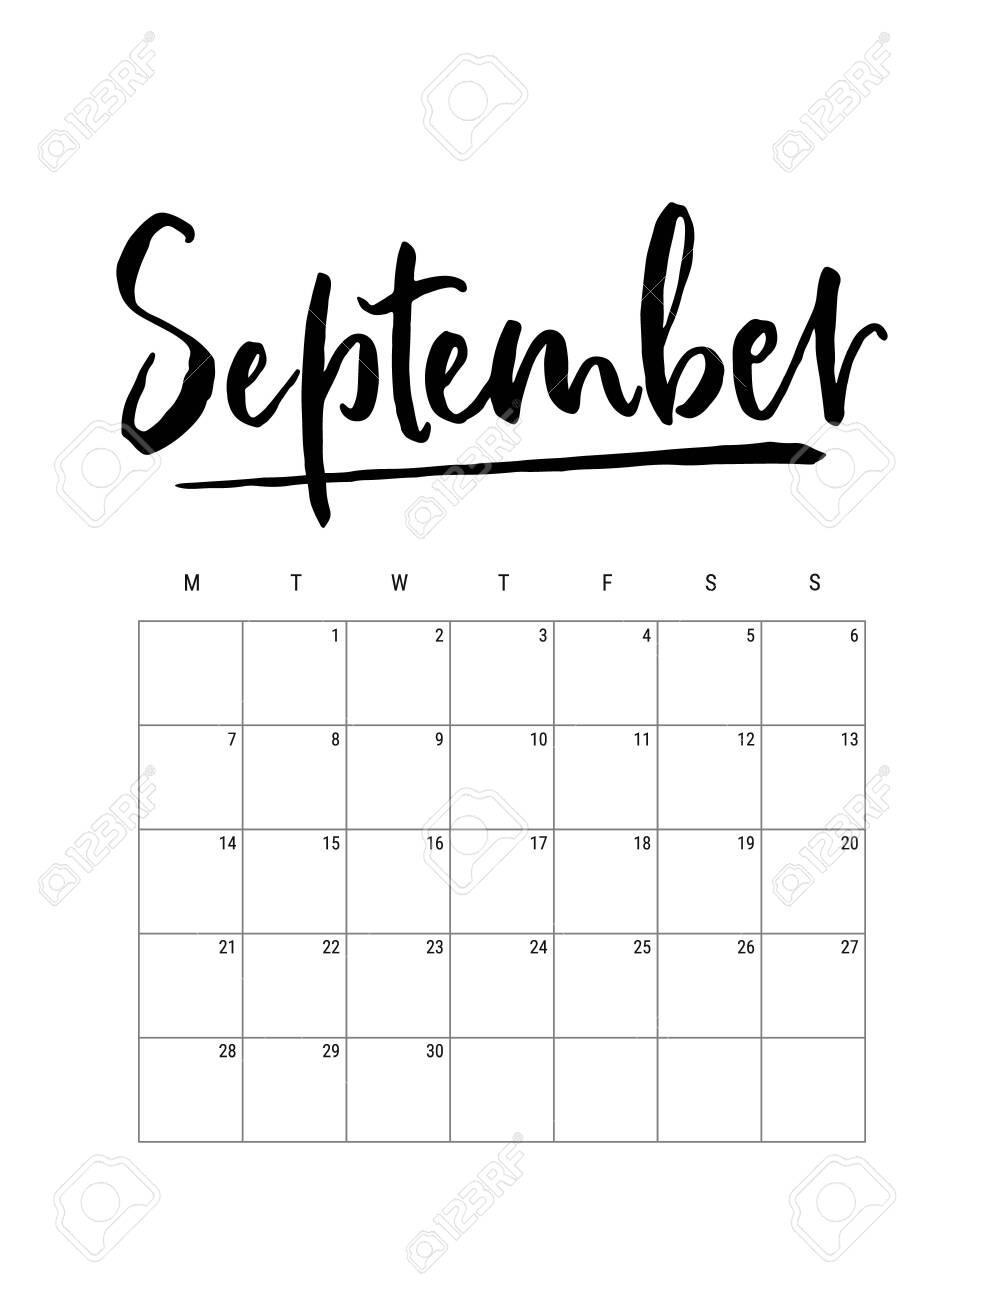 2020 September Month Wall Calendar Desk Planner Weeks Start Royalty Free Cliparts Vectors And Stock Illustration Image 134252769